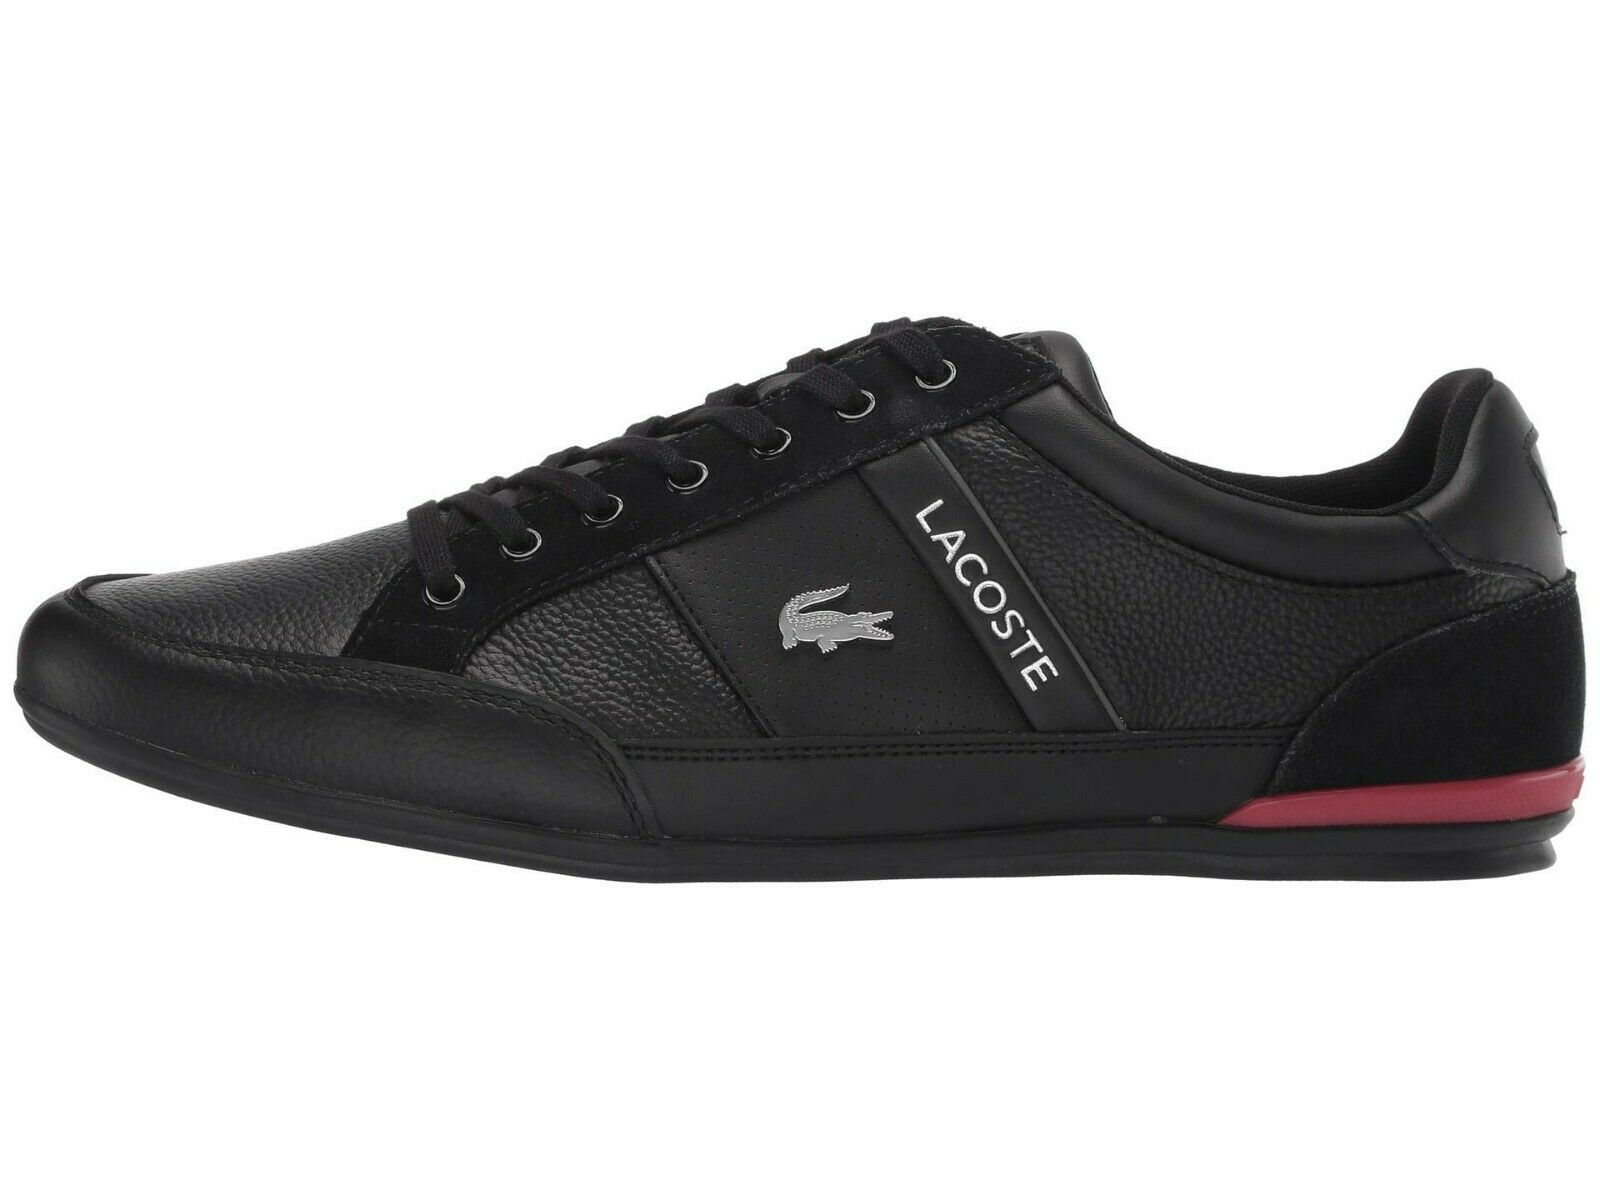 LACOSTE Chaymon 319 Croc Logo Leather Shoes Men's Fashion Sneakers Black Red